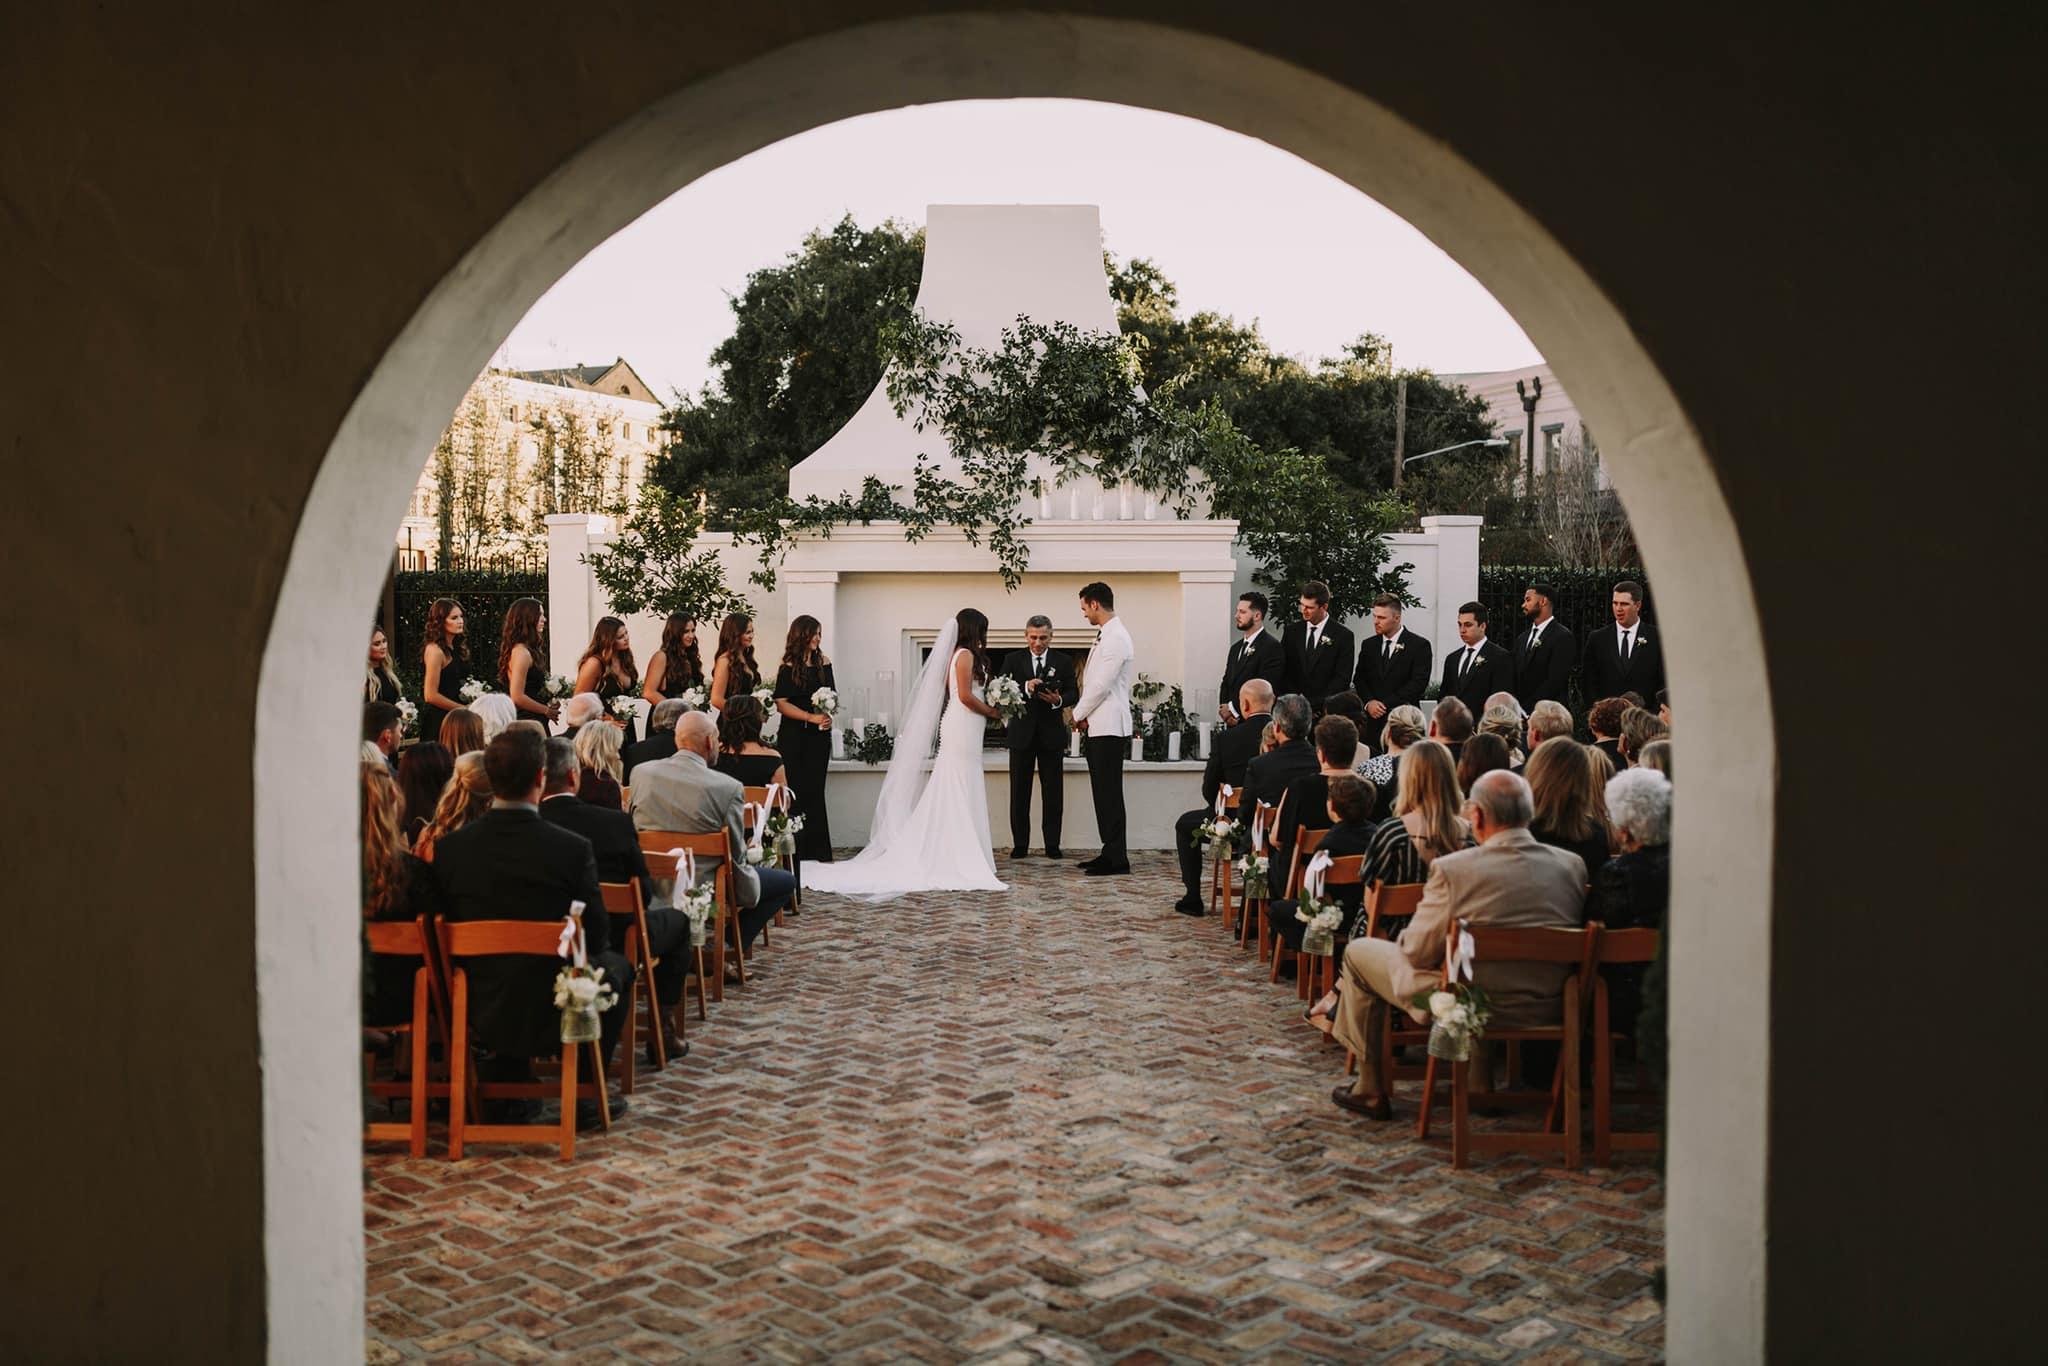 Elegant Black Tie Wedding Ceremony at Il Mercato Wedding Venue in New Orleans